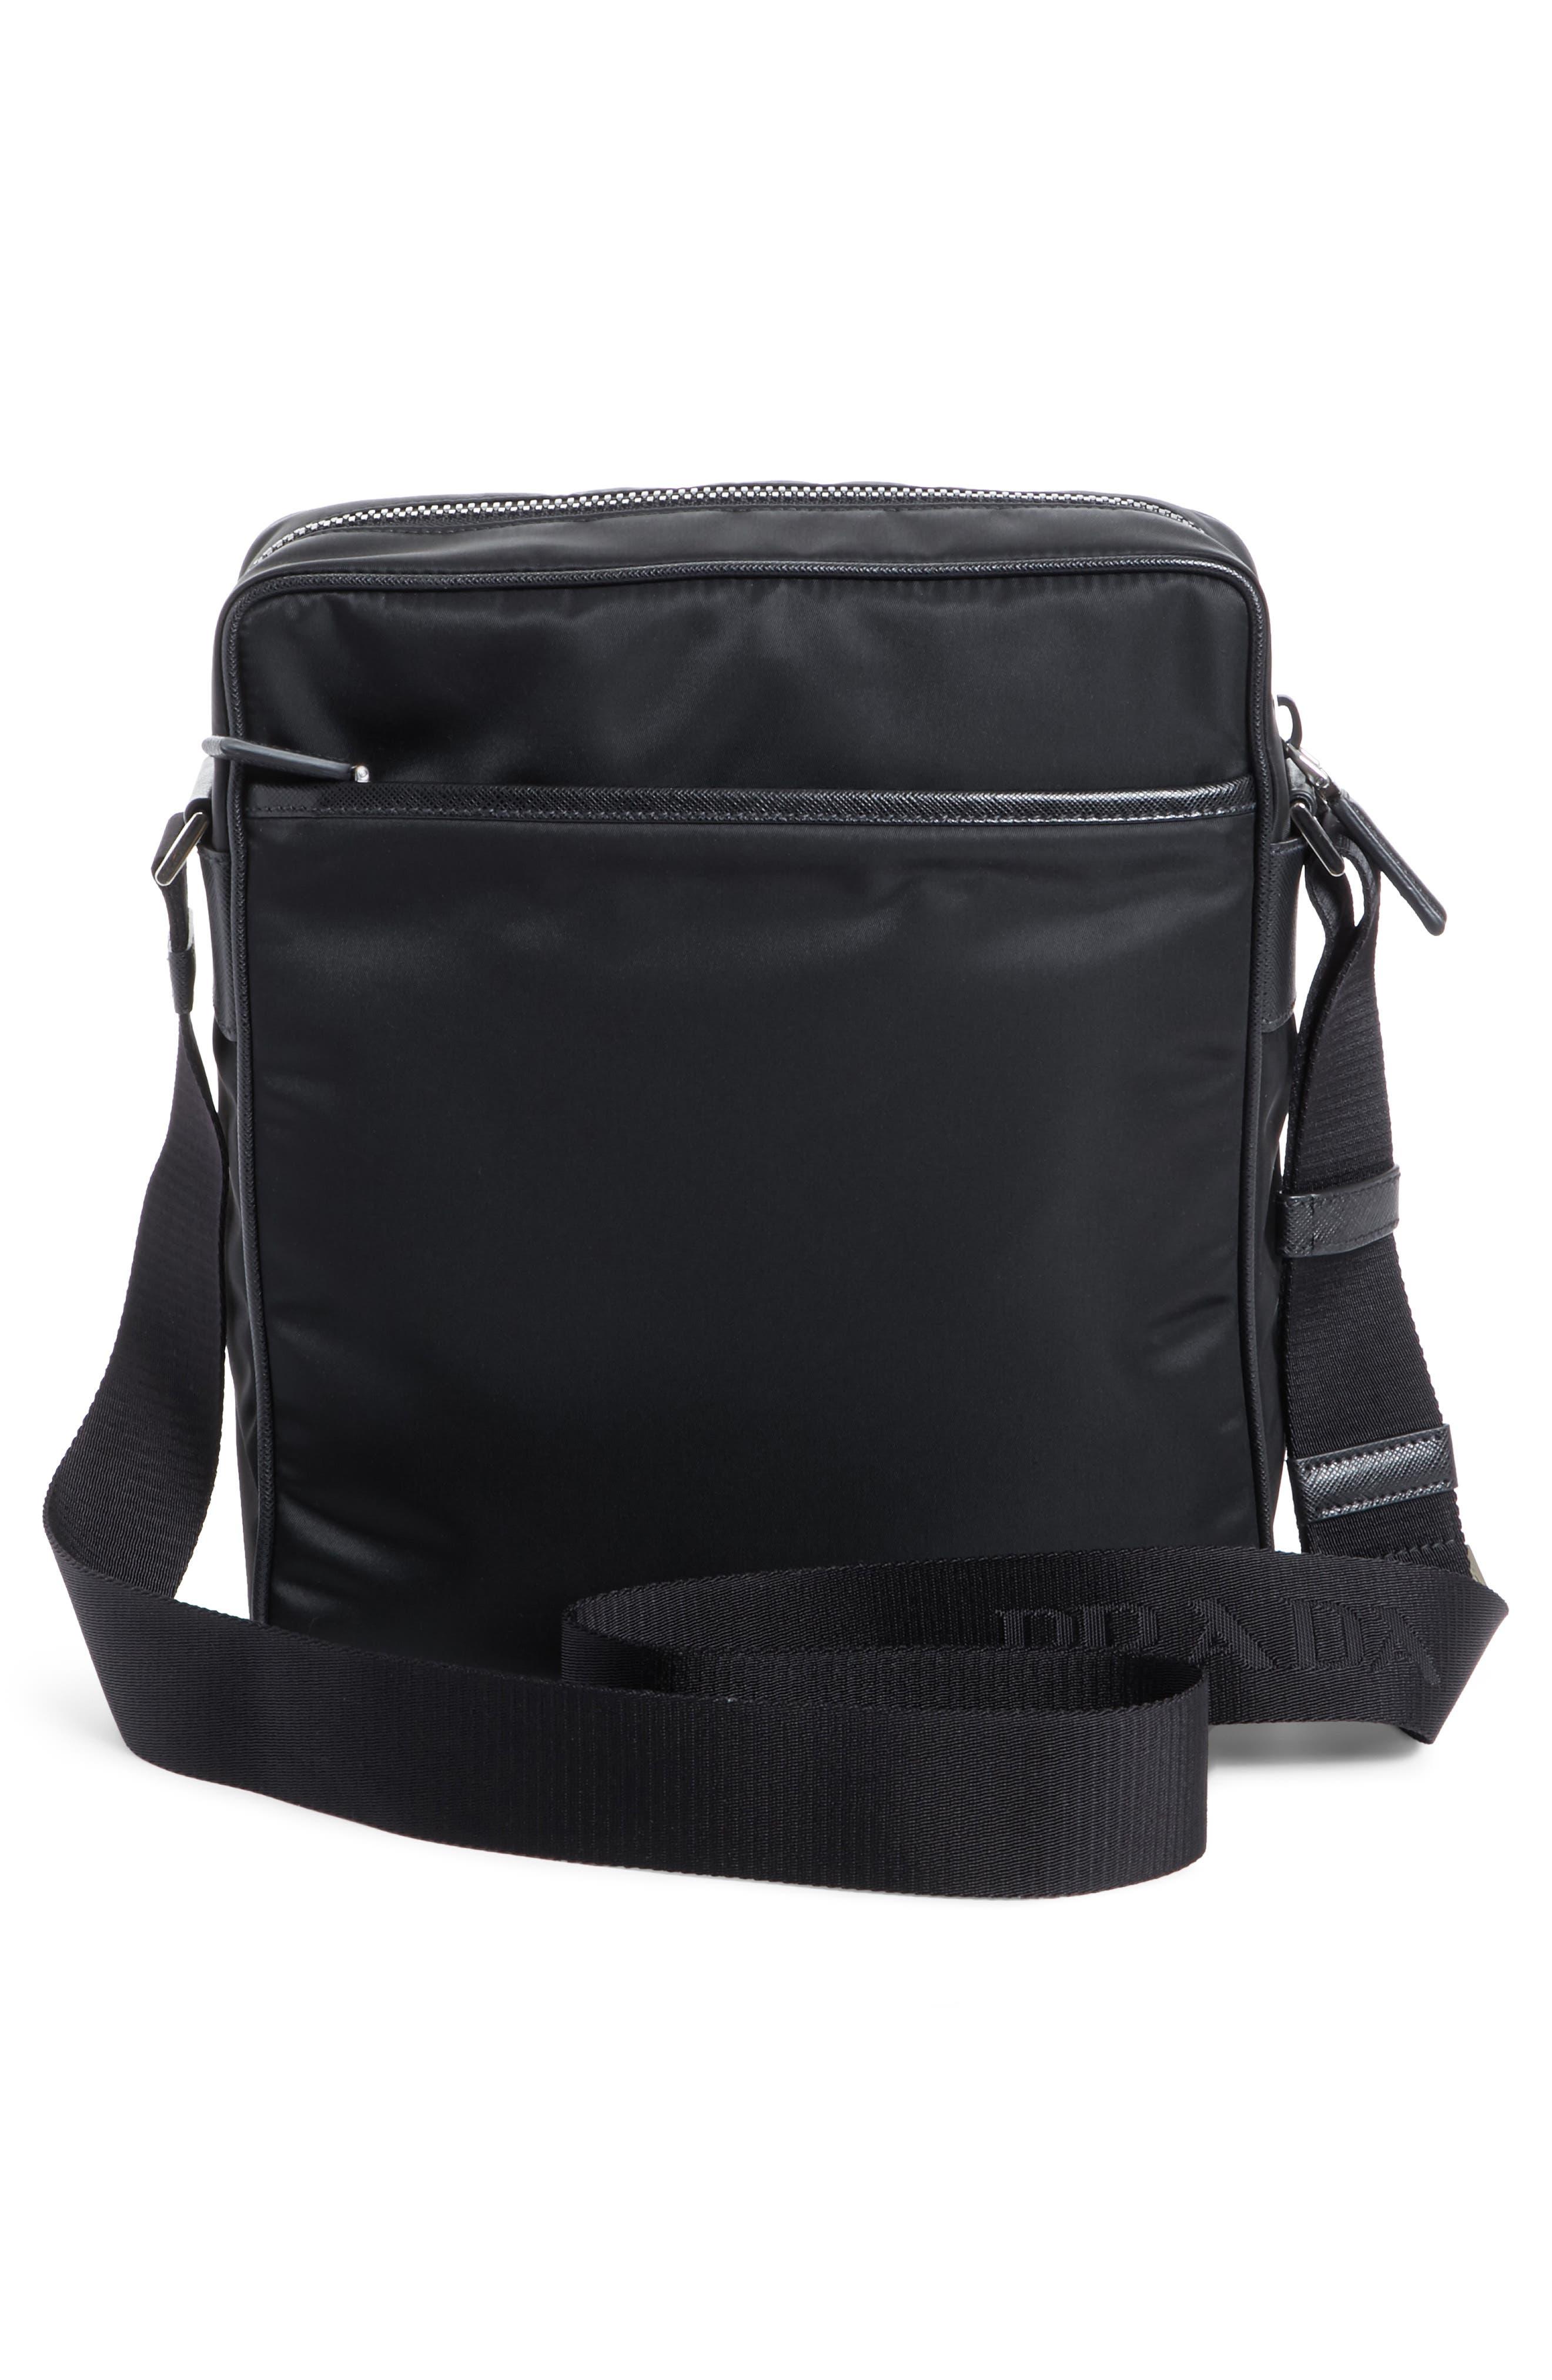 Saffiano Leather Crossbody Bag,                             Alternate thumbnail 3, color,                             001